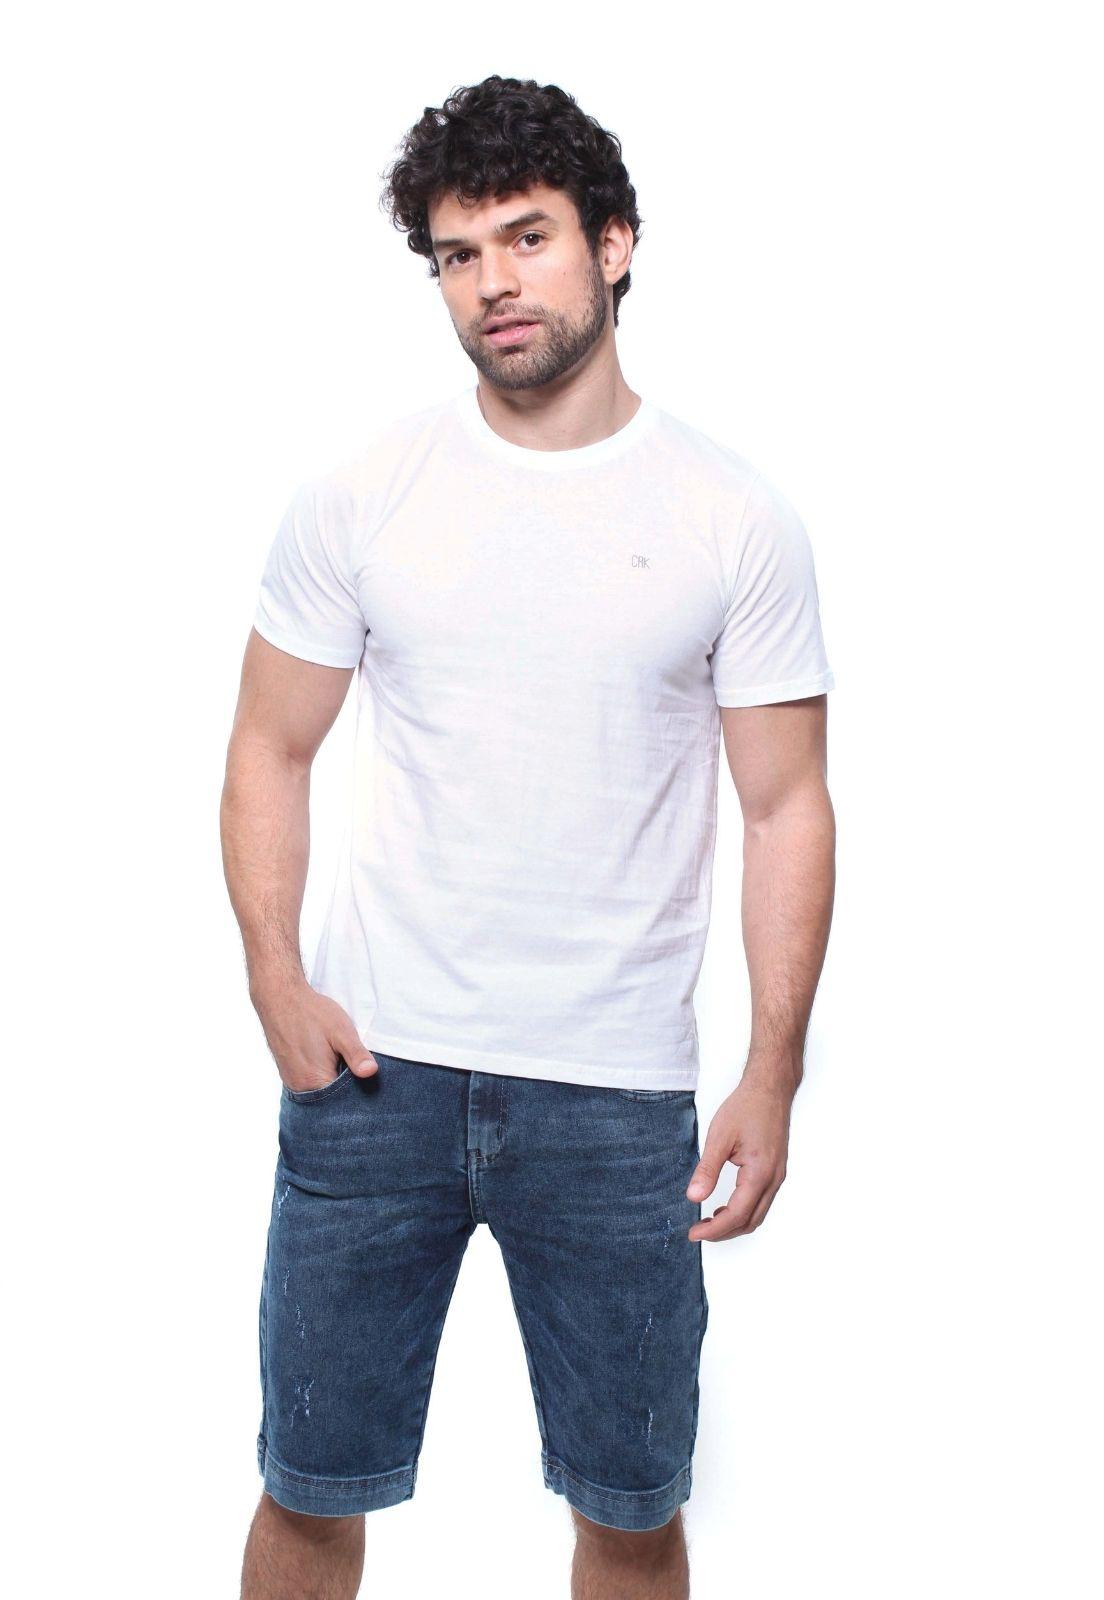 Camiseta Boylook Masculina Manga Curta Crocker - 47999  - CROCKER JEANS